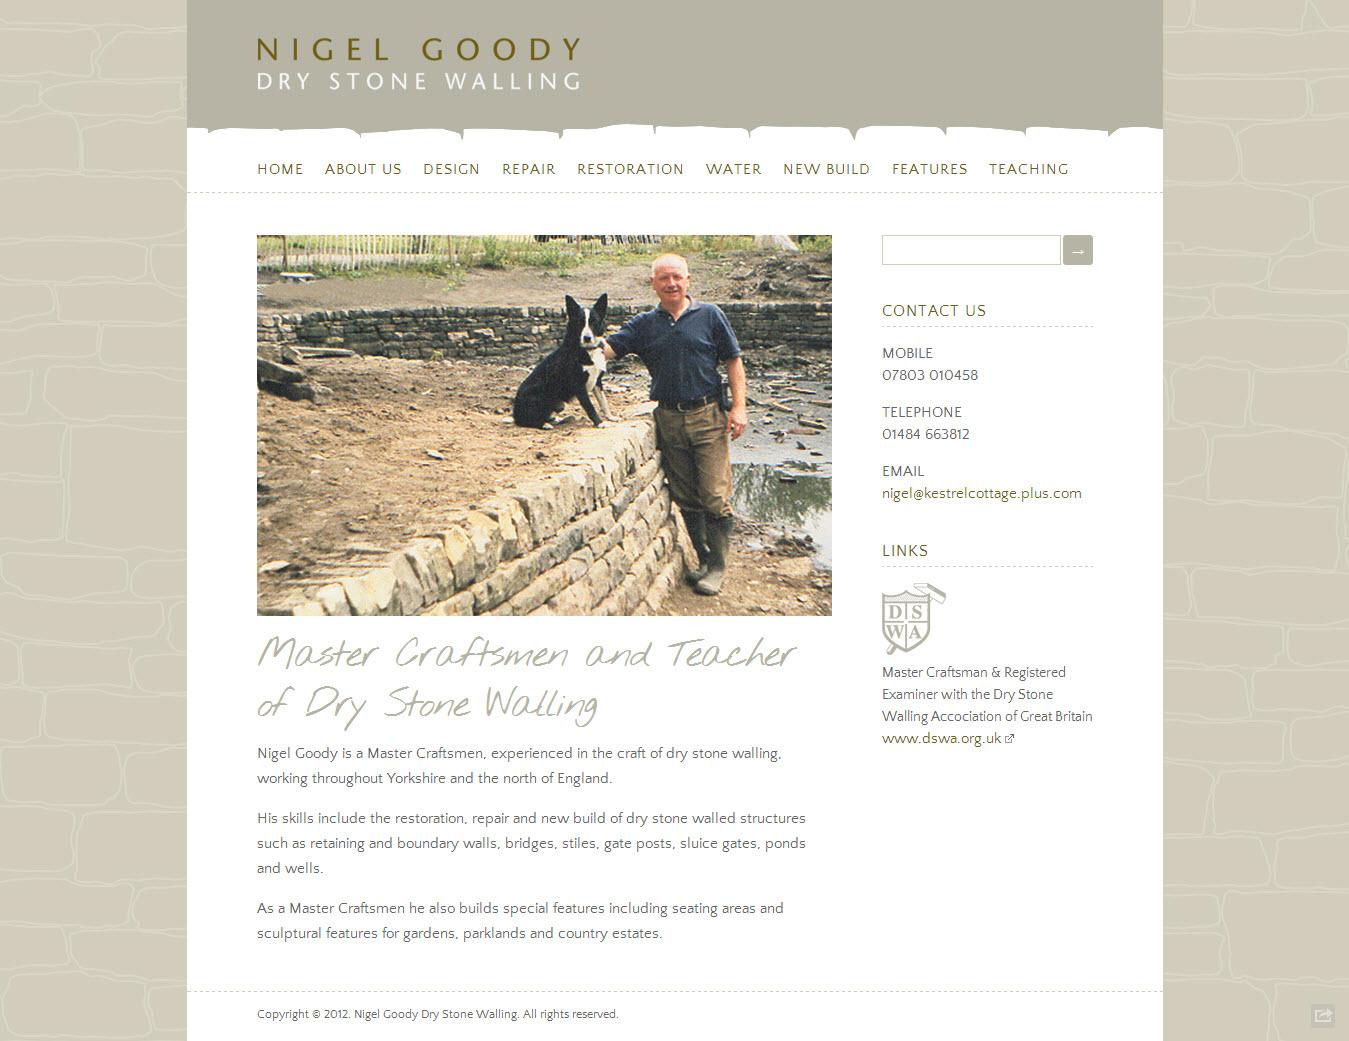 Nigel Goody